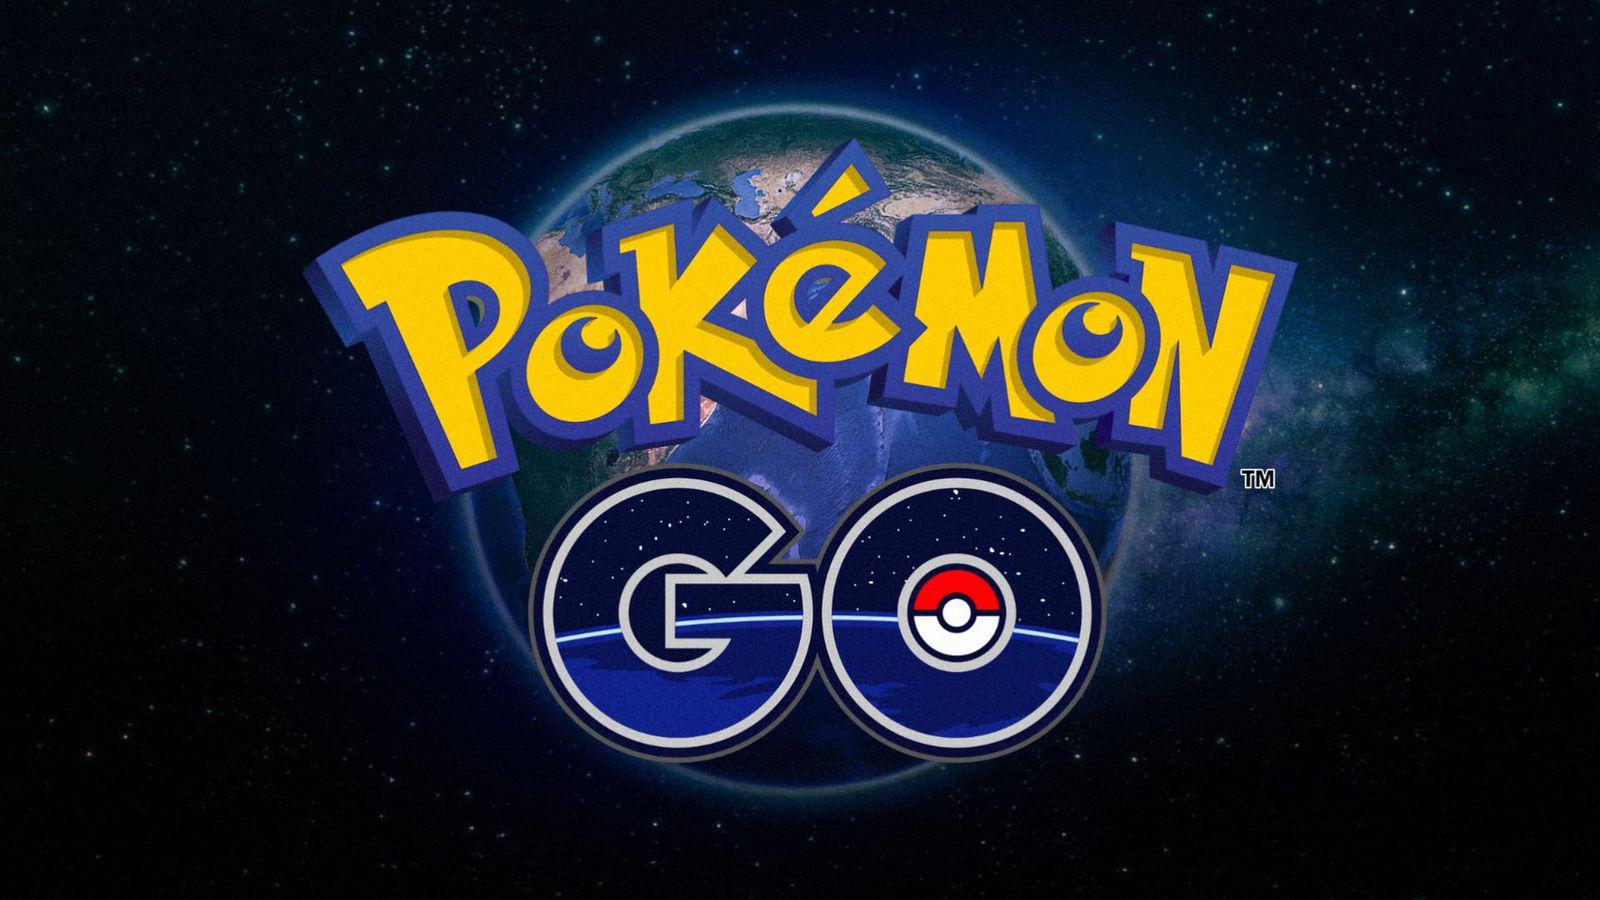 Modojo | Pokemon Go Still Has 65 Million Active Users